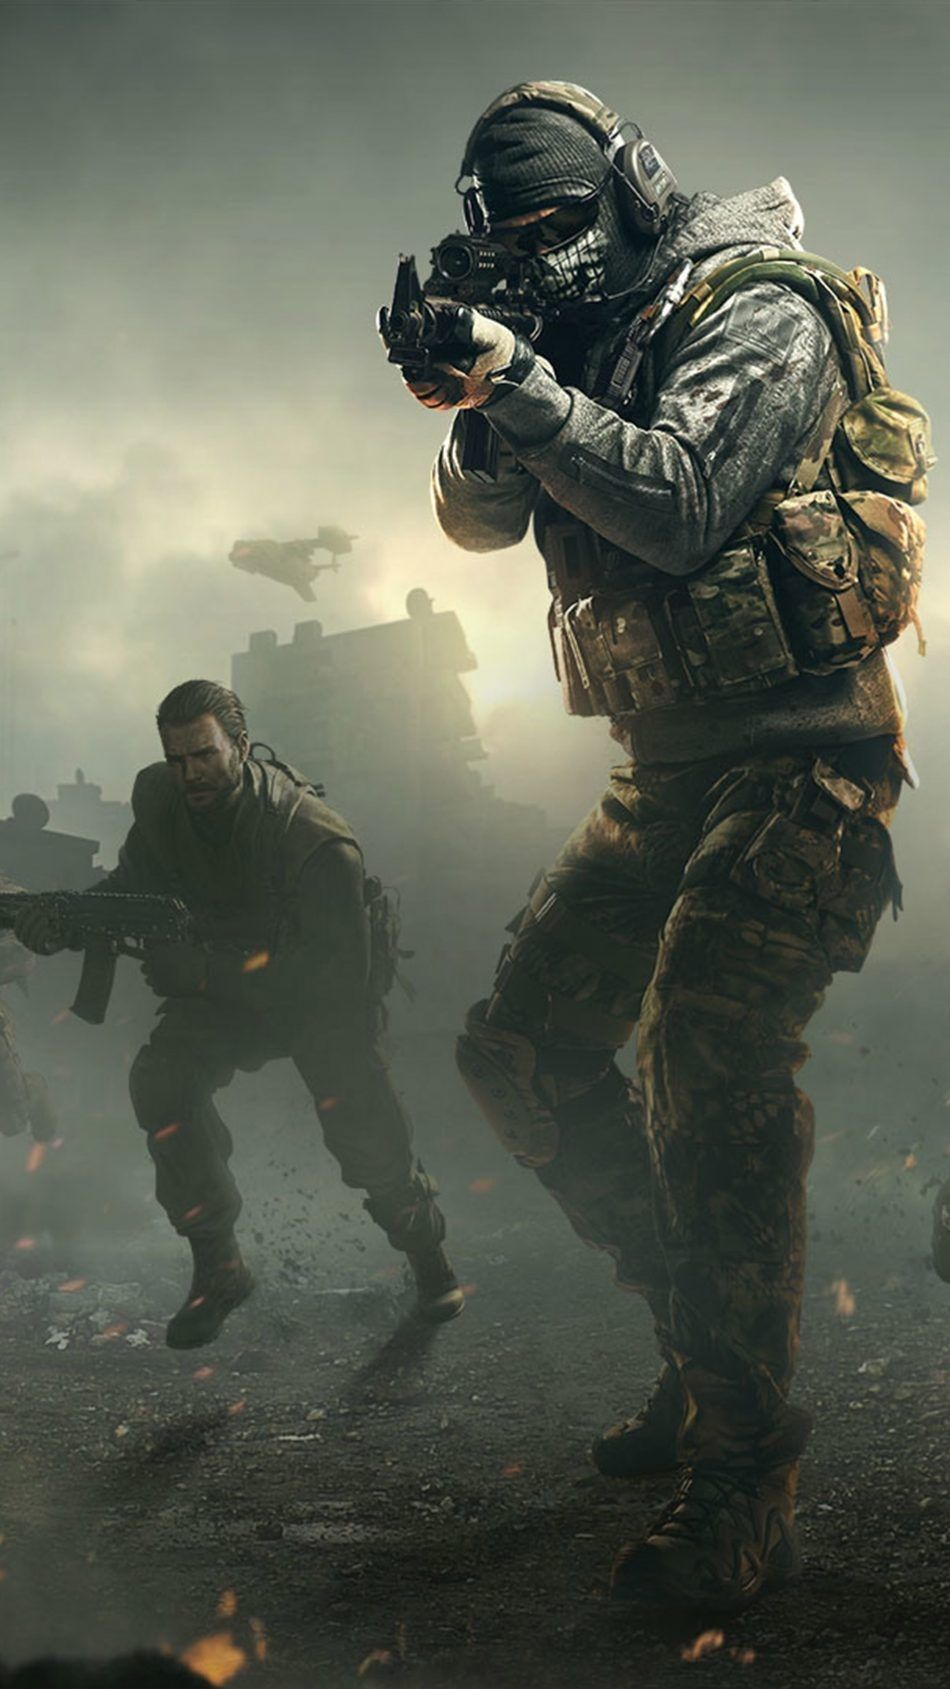 Call Of Duty Modern Warfare Call Of Duty Modern Warfare Remastered Split Screen Online Fondos De Pantalla De Juegos Fotos De Gamers Imagenes Militares